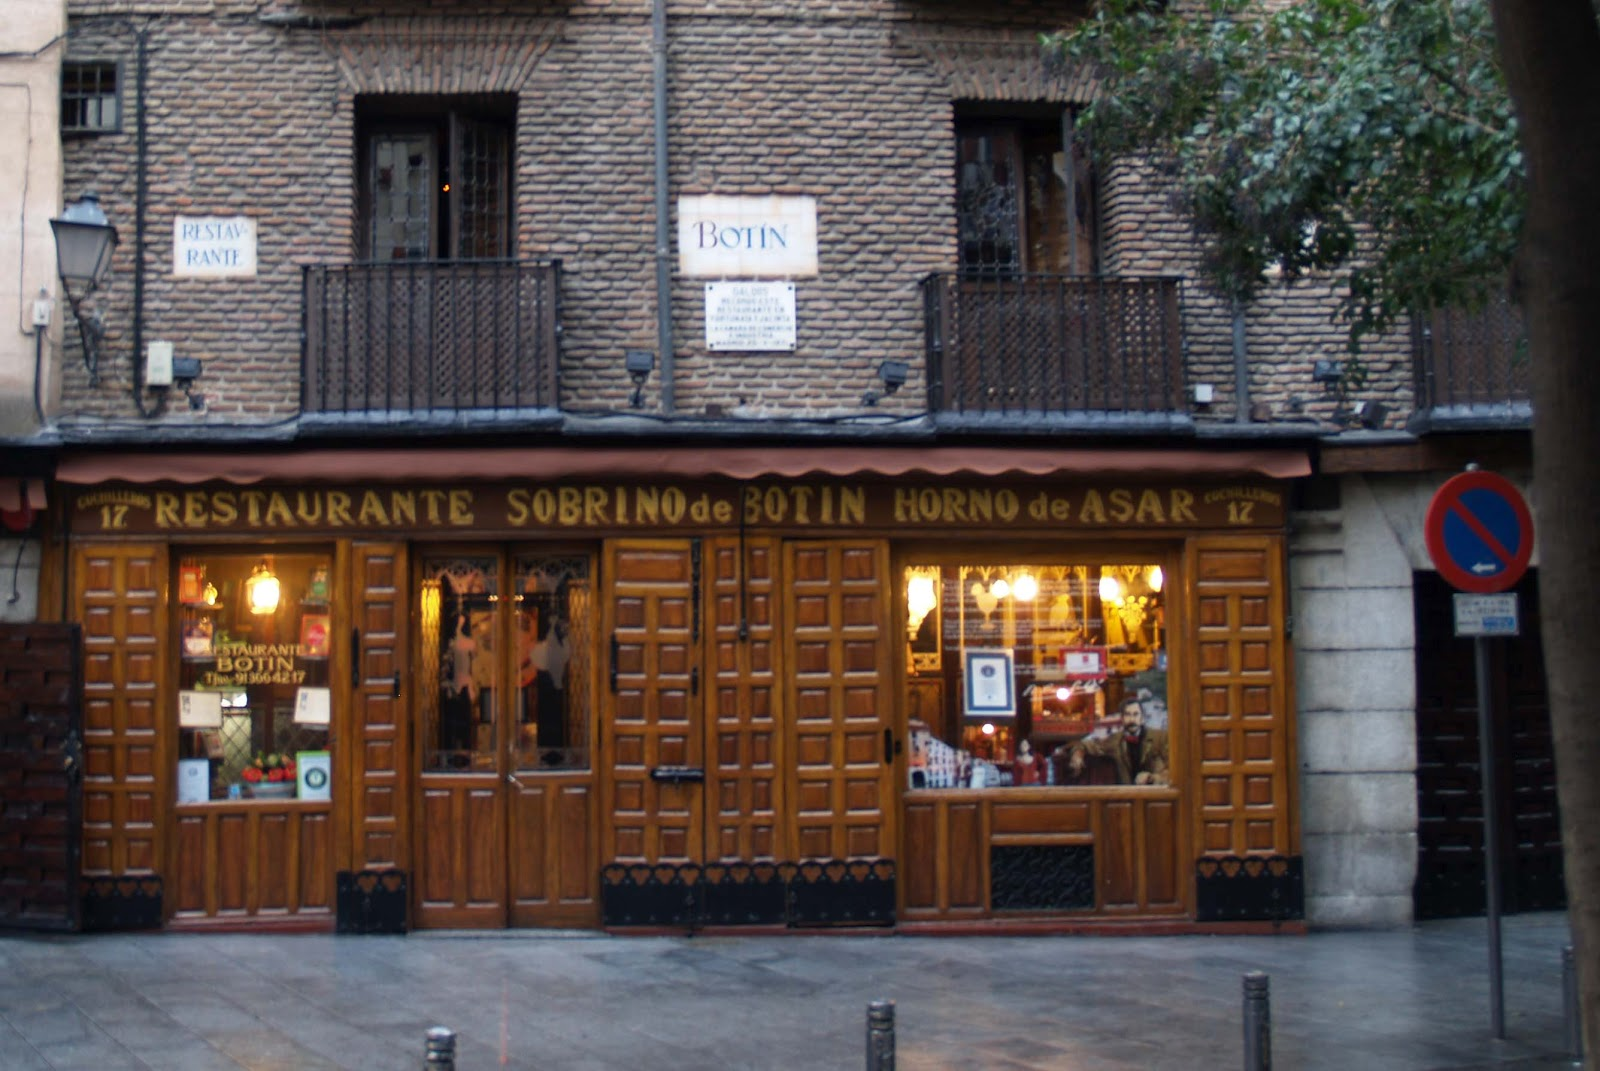 Caminando por madrid bot n restaurante pionero for Casa botin madrid